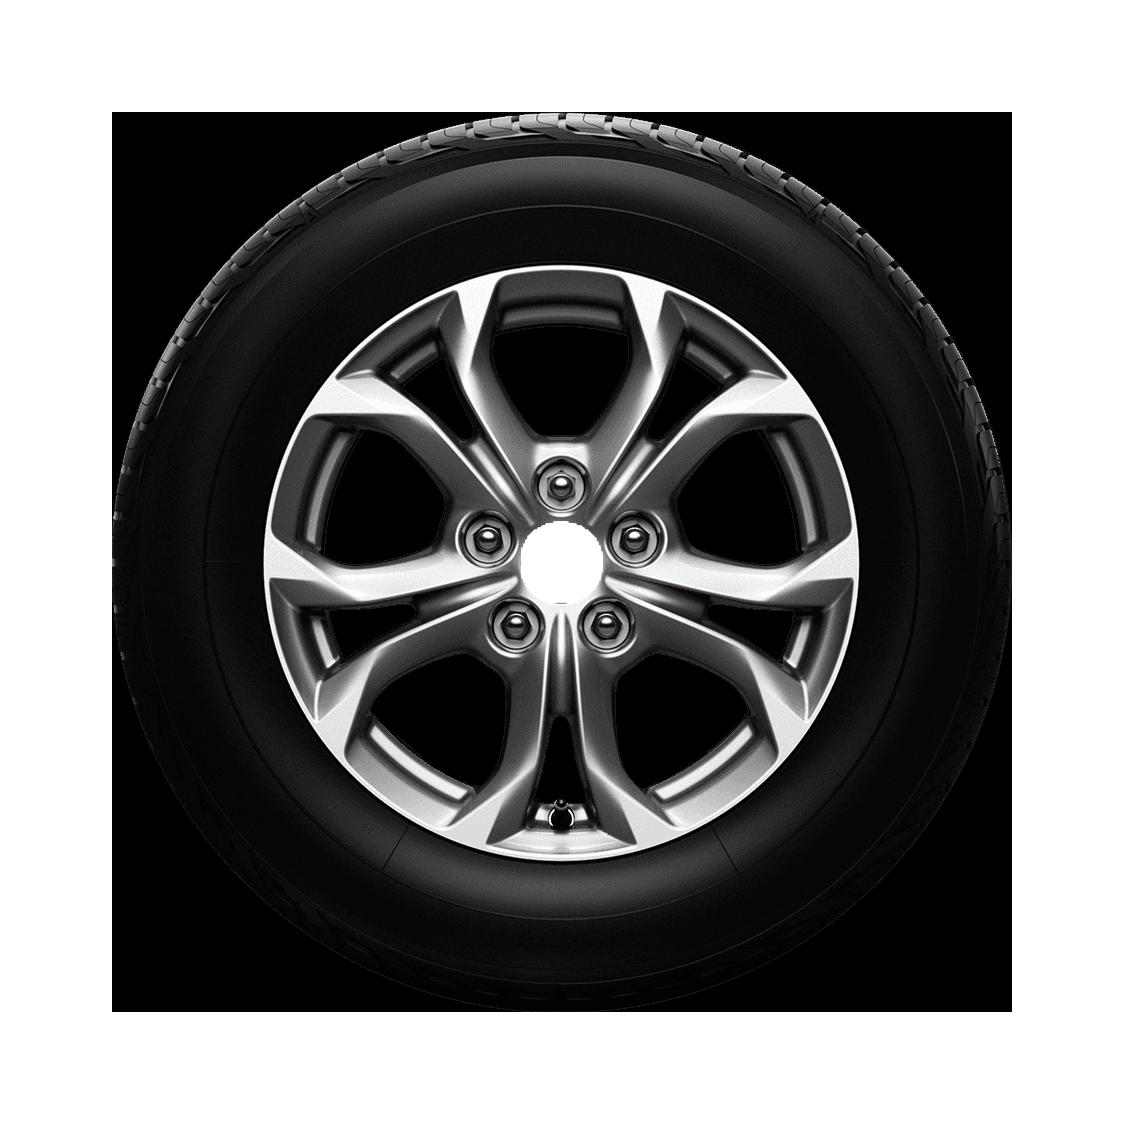 DAI Wheels Tuning Satin Black